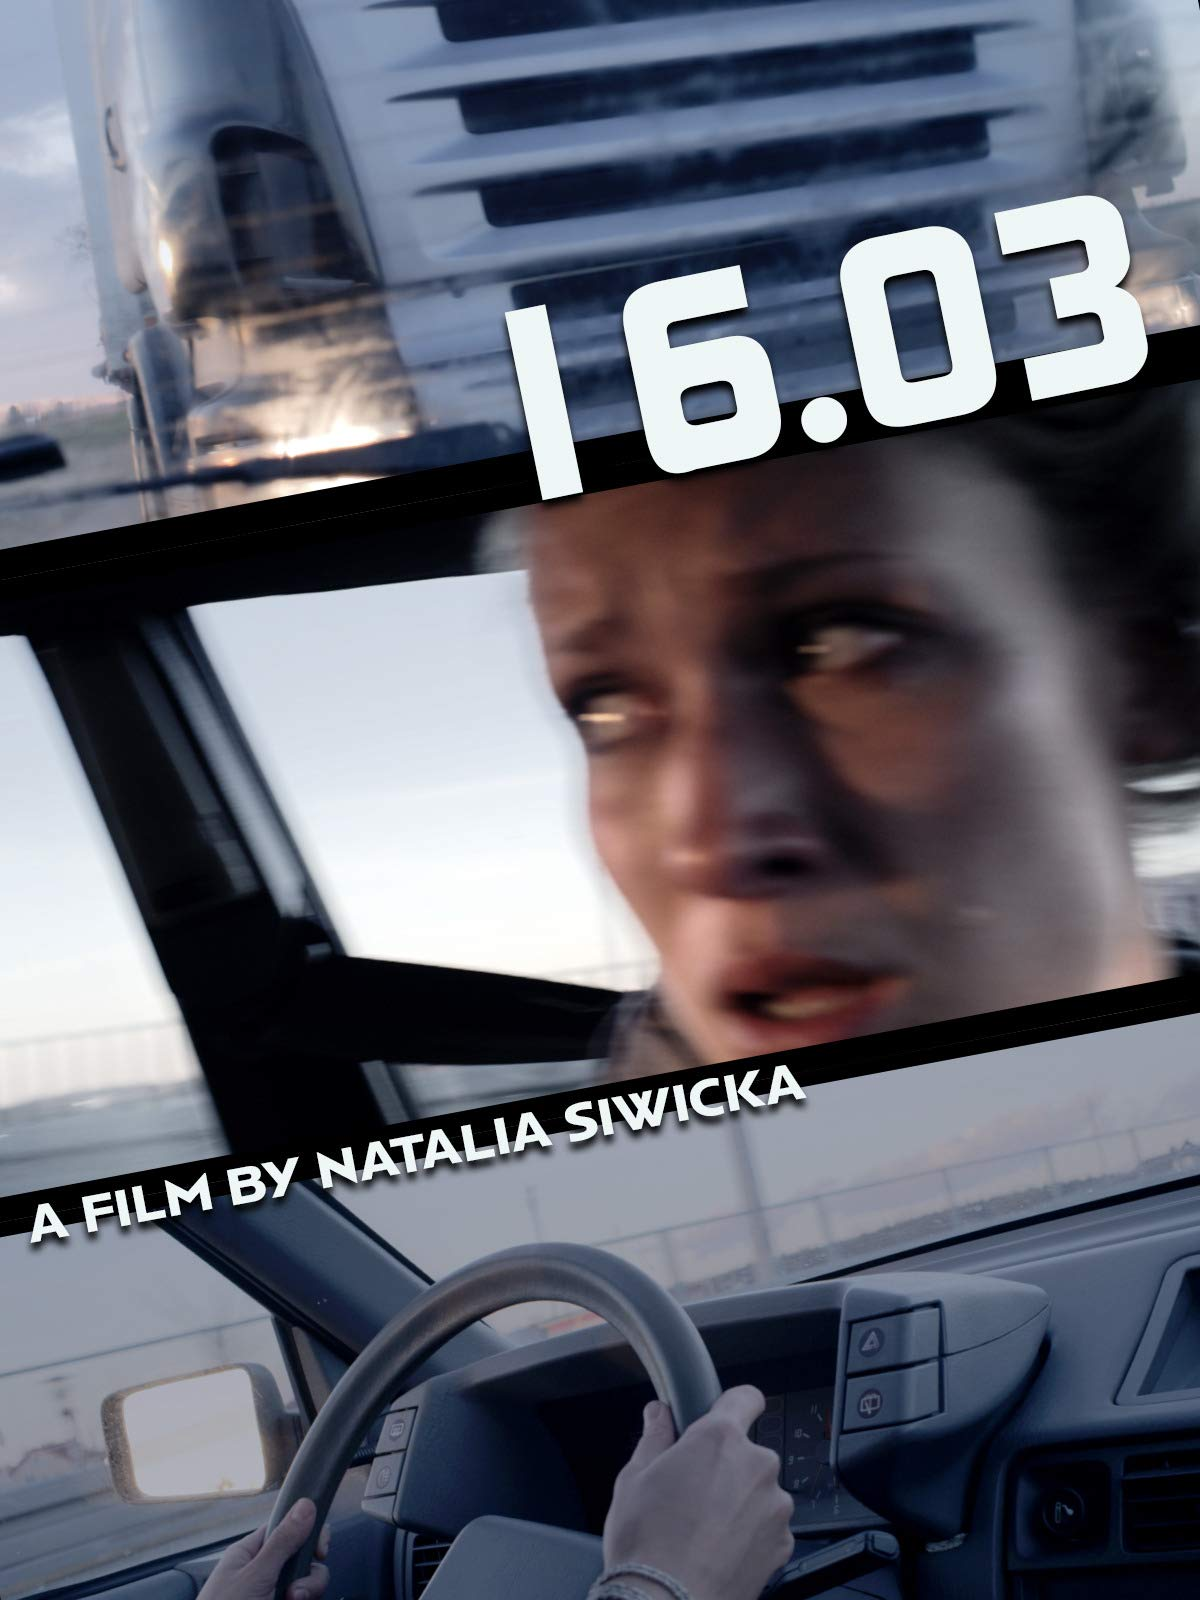 16.03